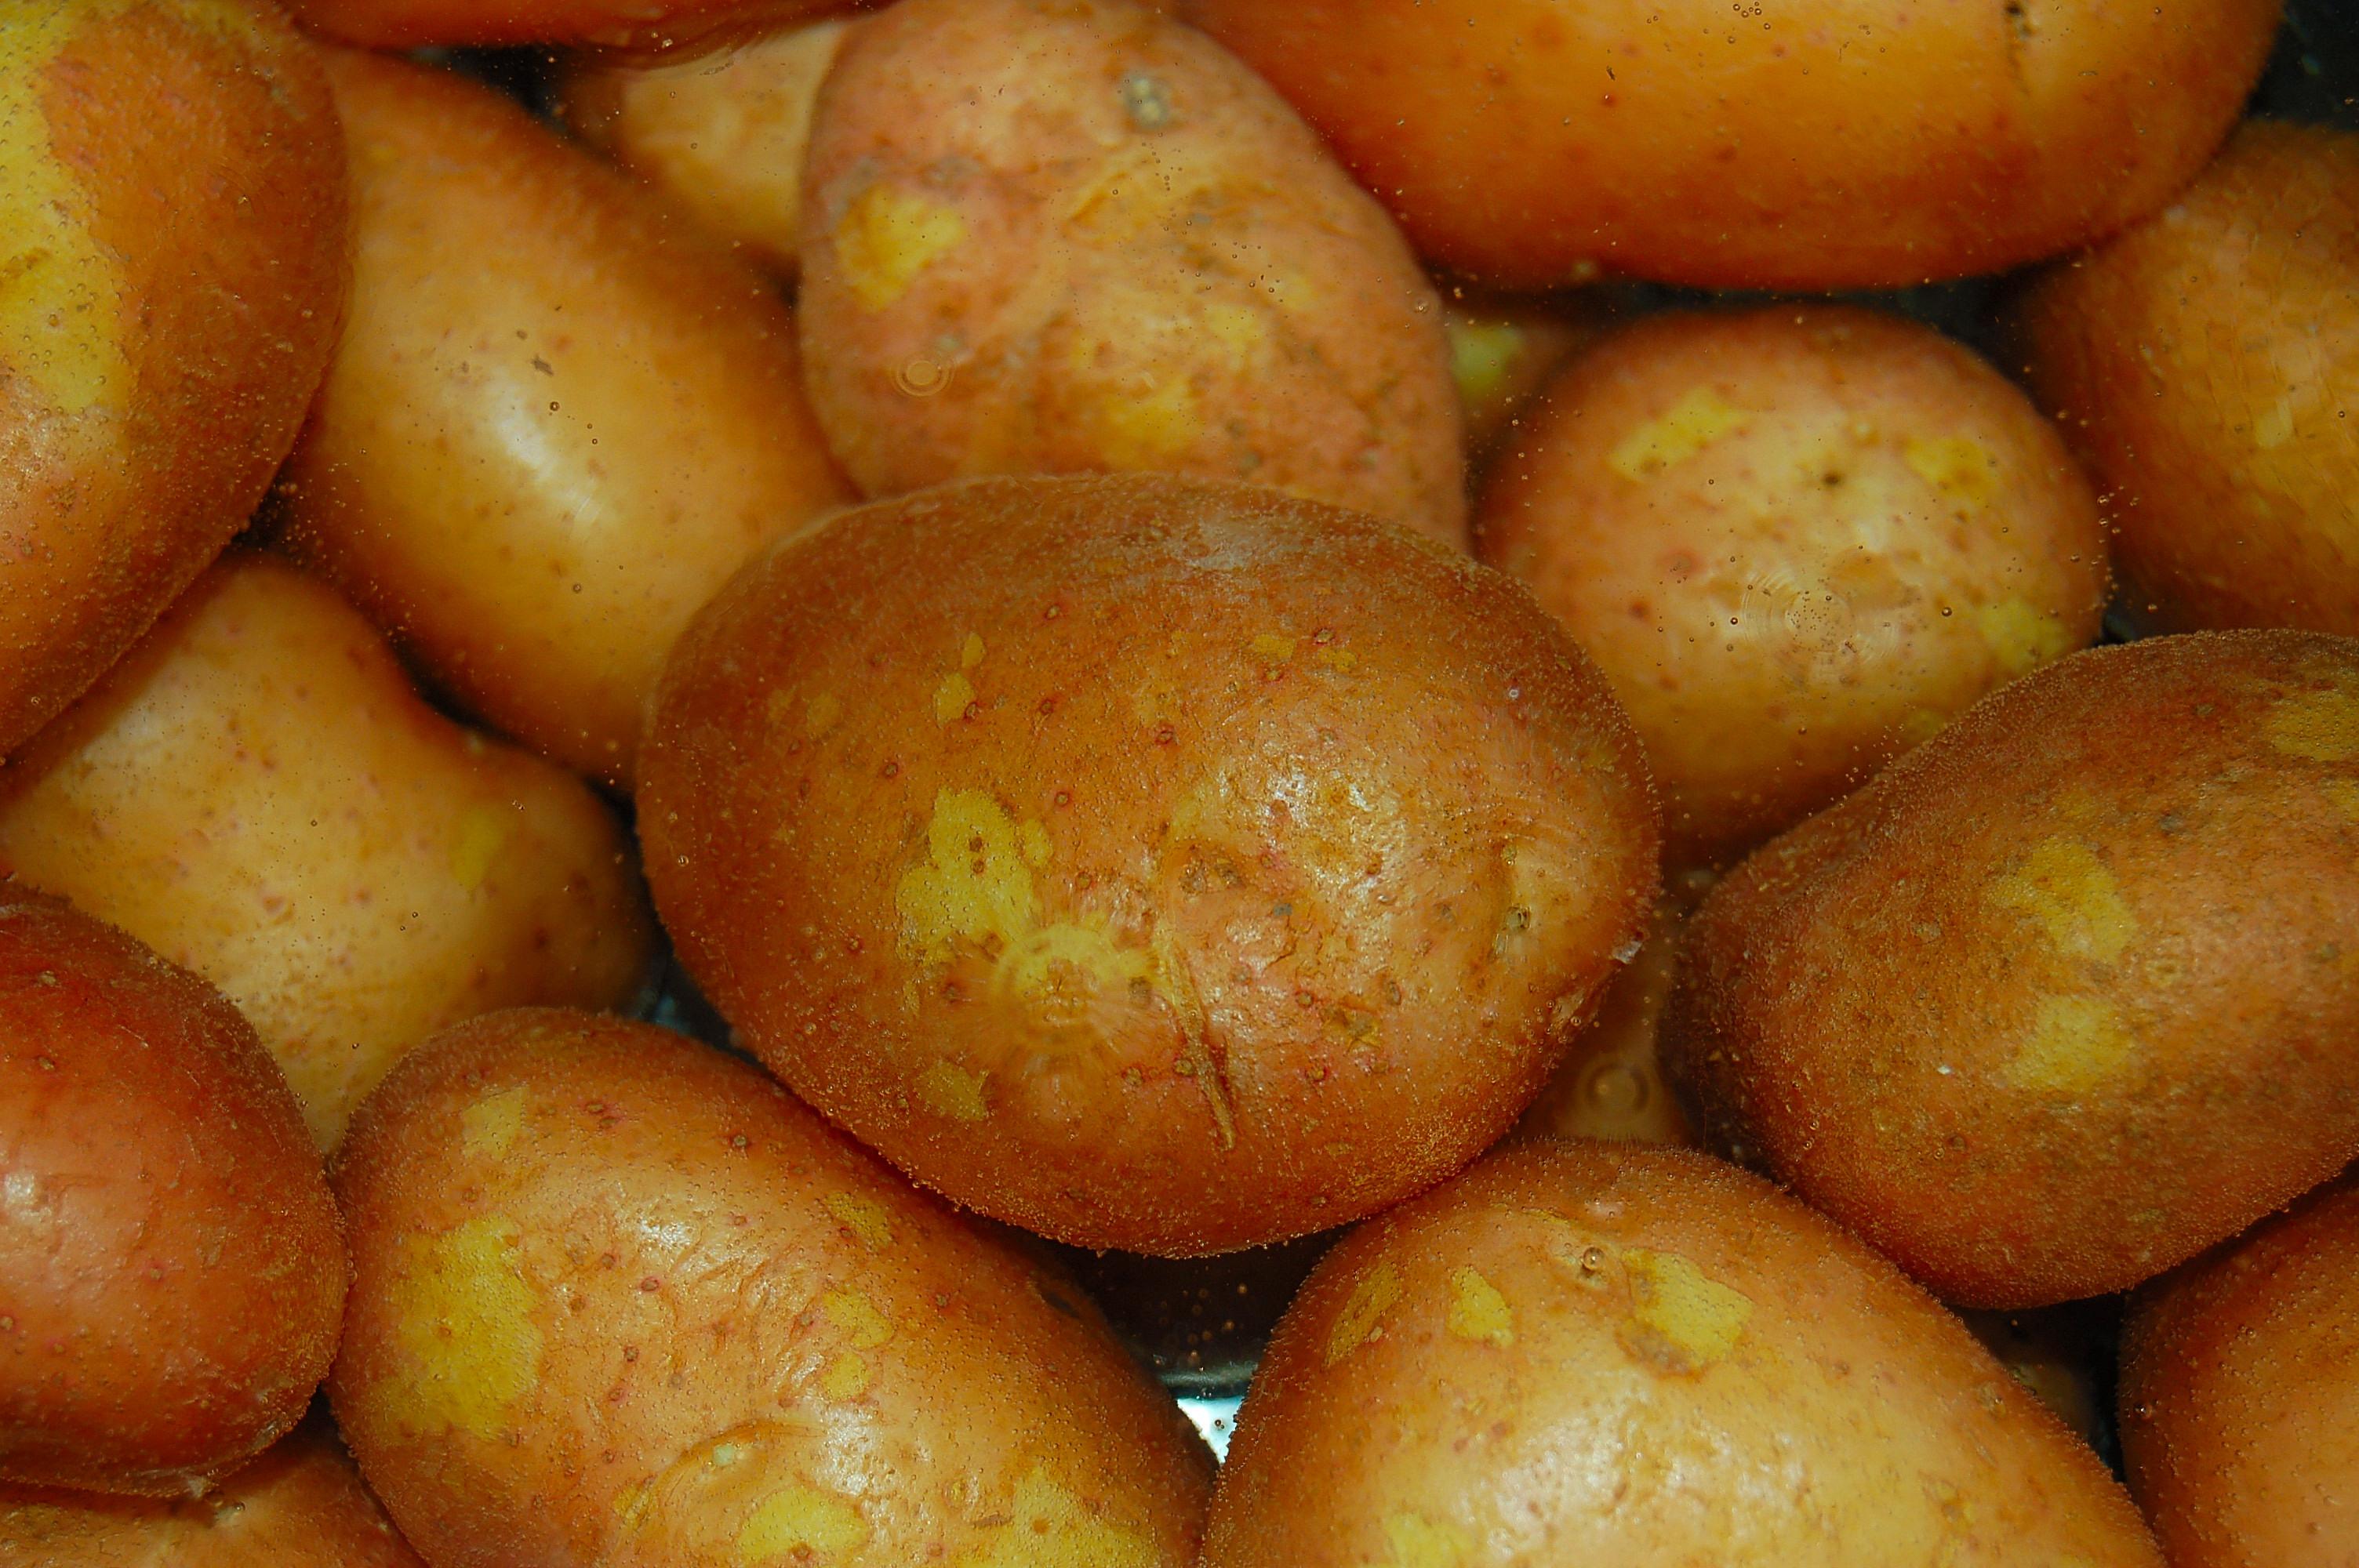 Bio-plastics: Turning Wheat And Potatoes into Plastics | Science